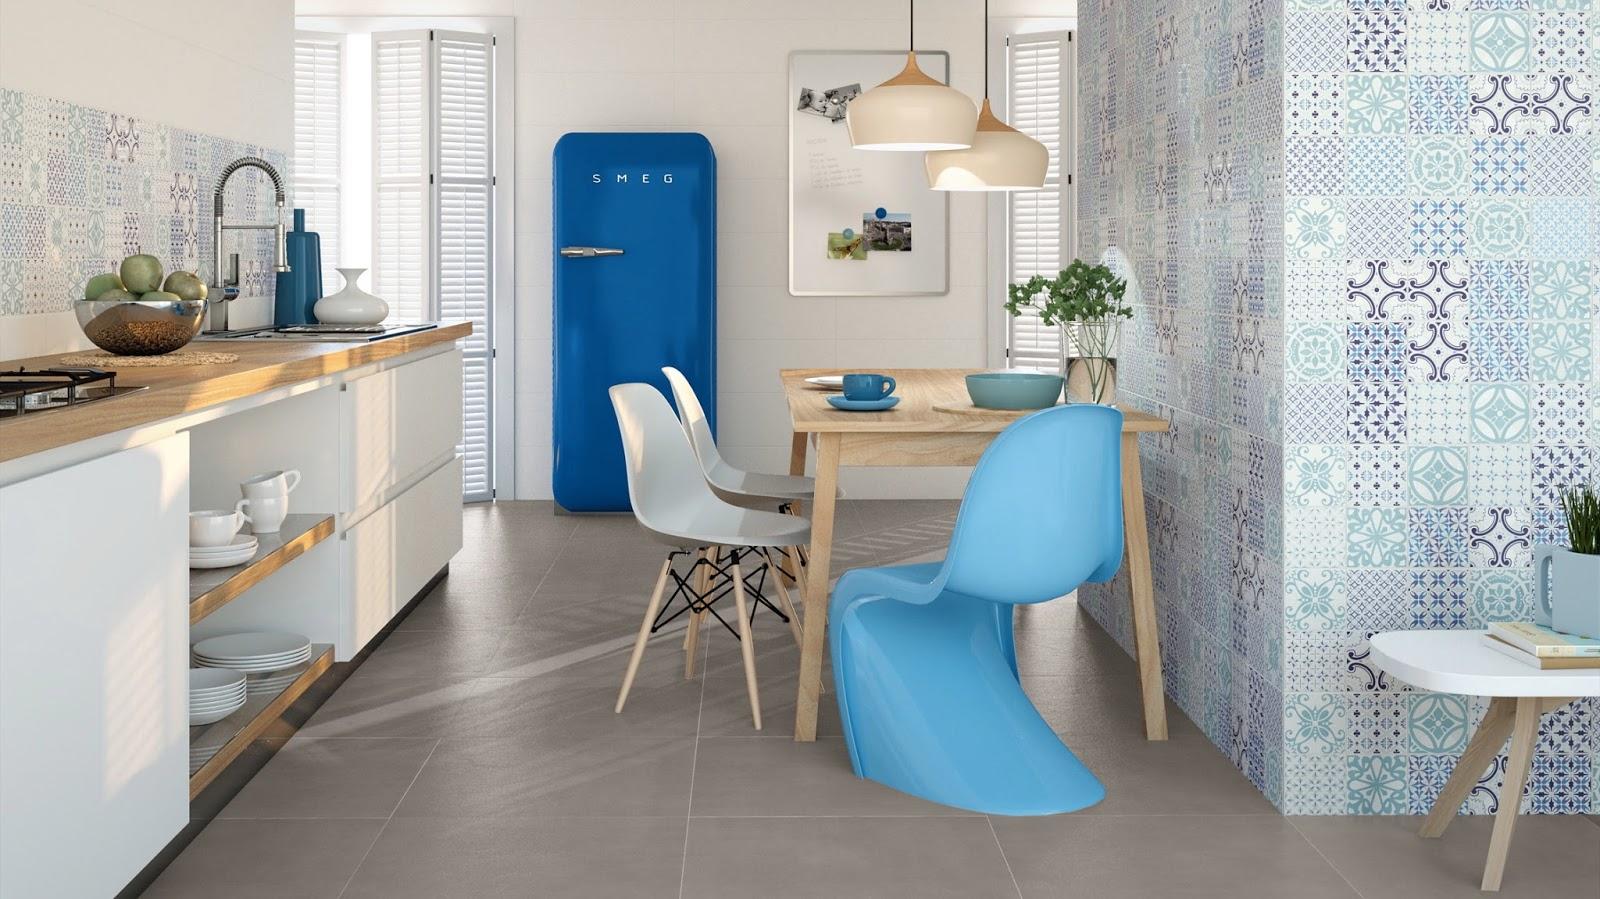 dave 39 s loft smeg la nevera que viste cocinas. Black Bedroom Furniture Sets. Home Design Ideas